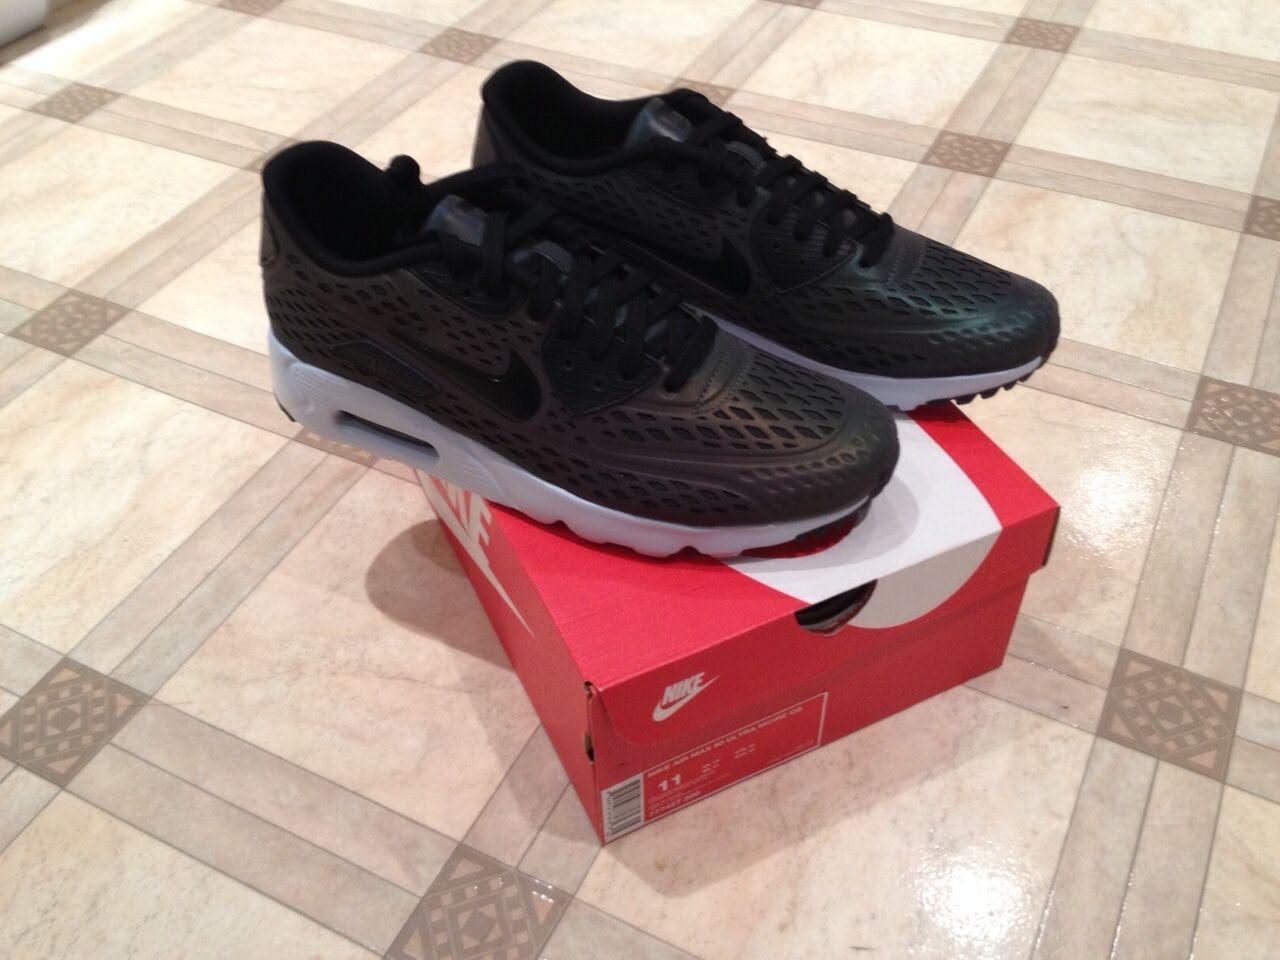 2018 Nike Air Max Ultra tamaños Moire Holograma Qs iridiscente tamaños Ultra Nueva ef23a4